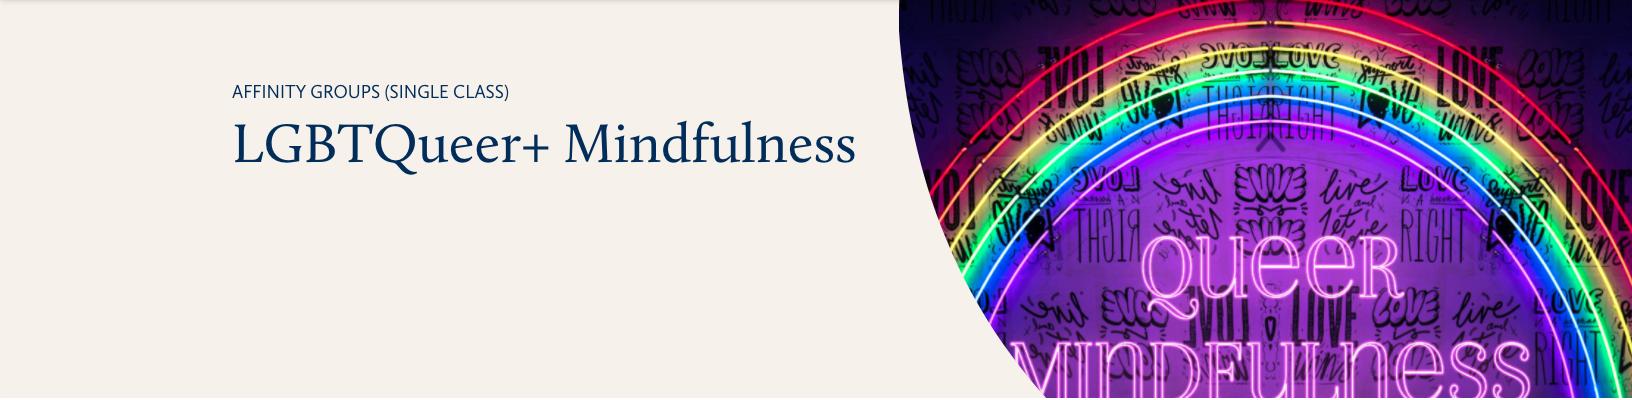 insightLA meditation: LGBTQueer+ Mindfulness